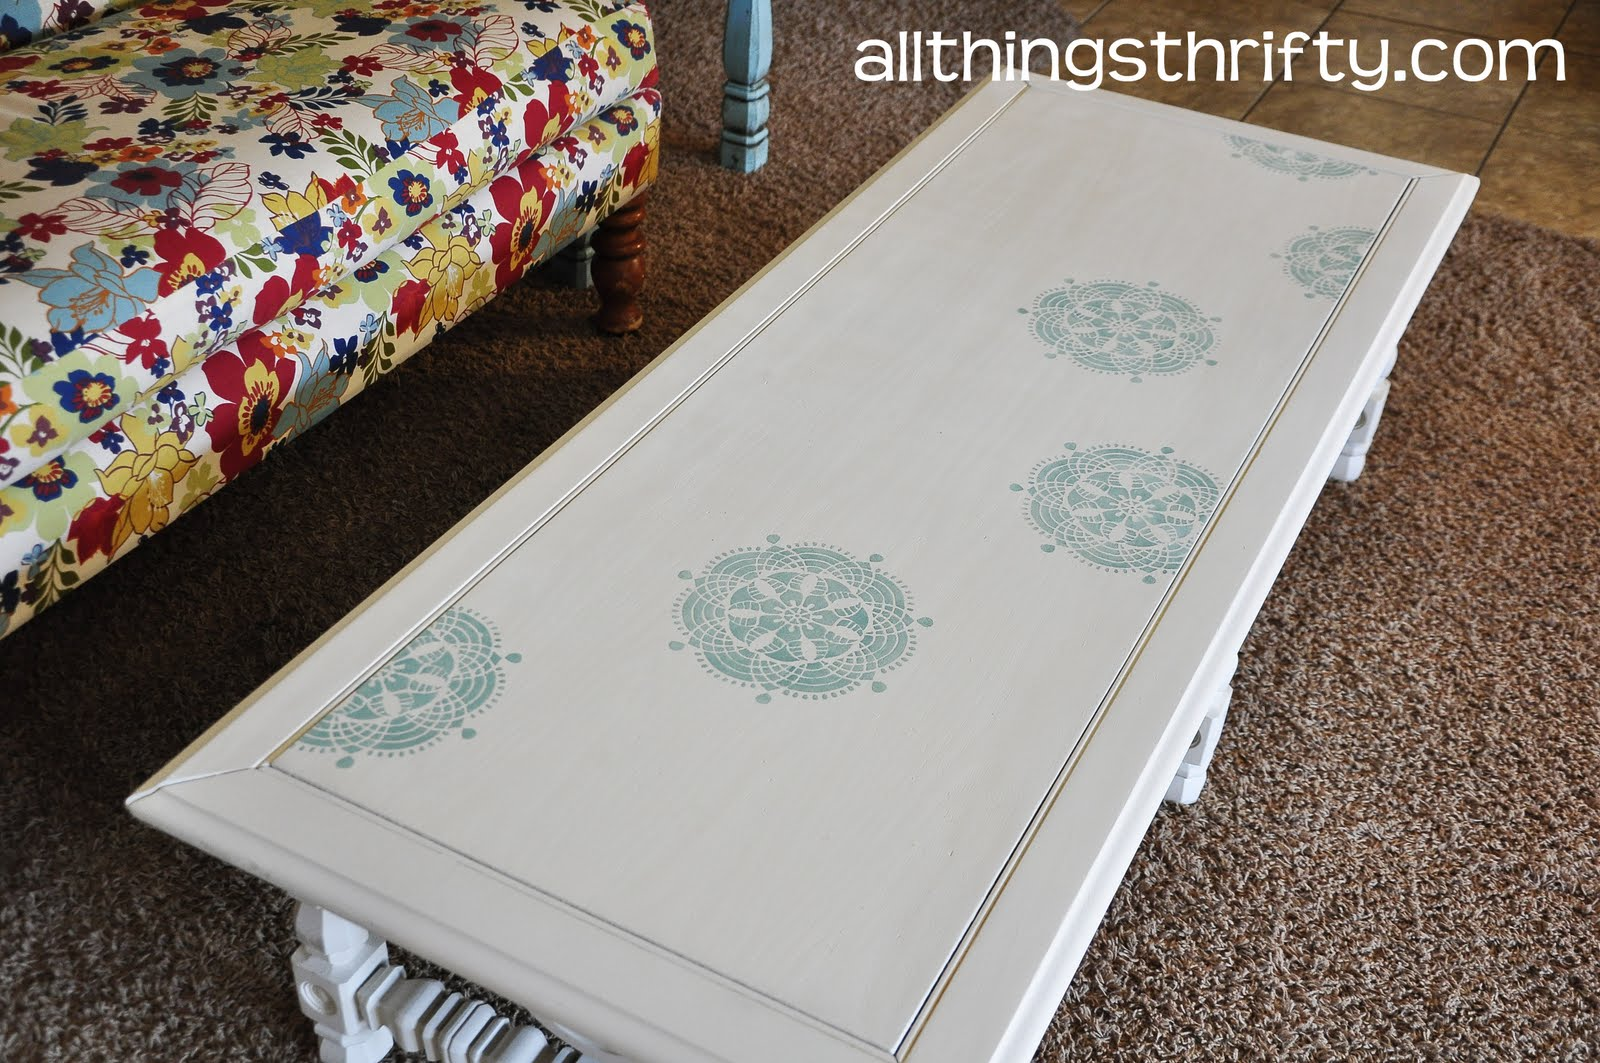 Yard Sale Coffee Table Transformation Via Martha Stewartu0027s Decorative Paint  Line By Plaid | All Things Thrifty